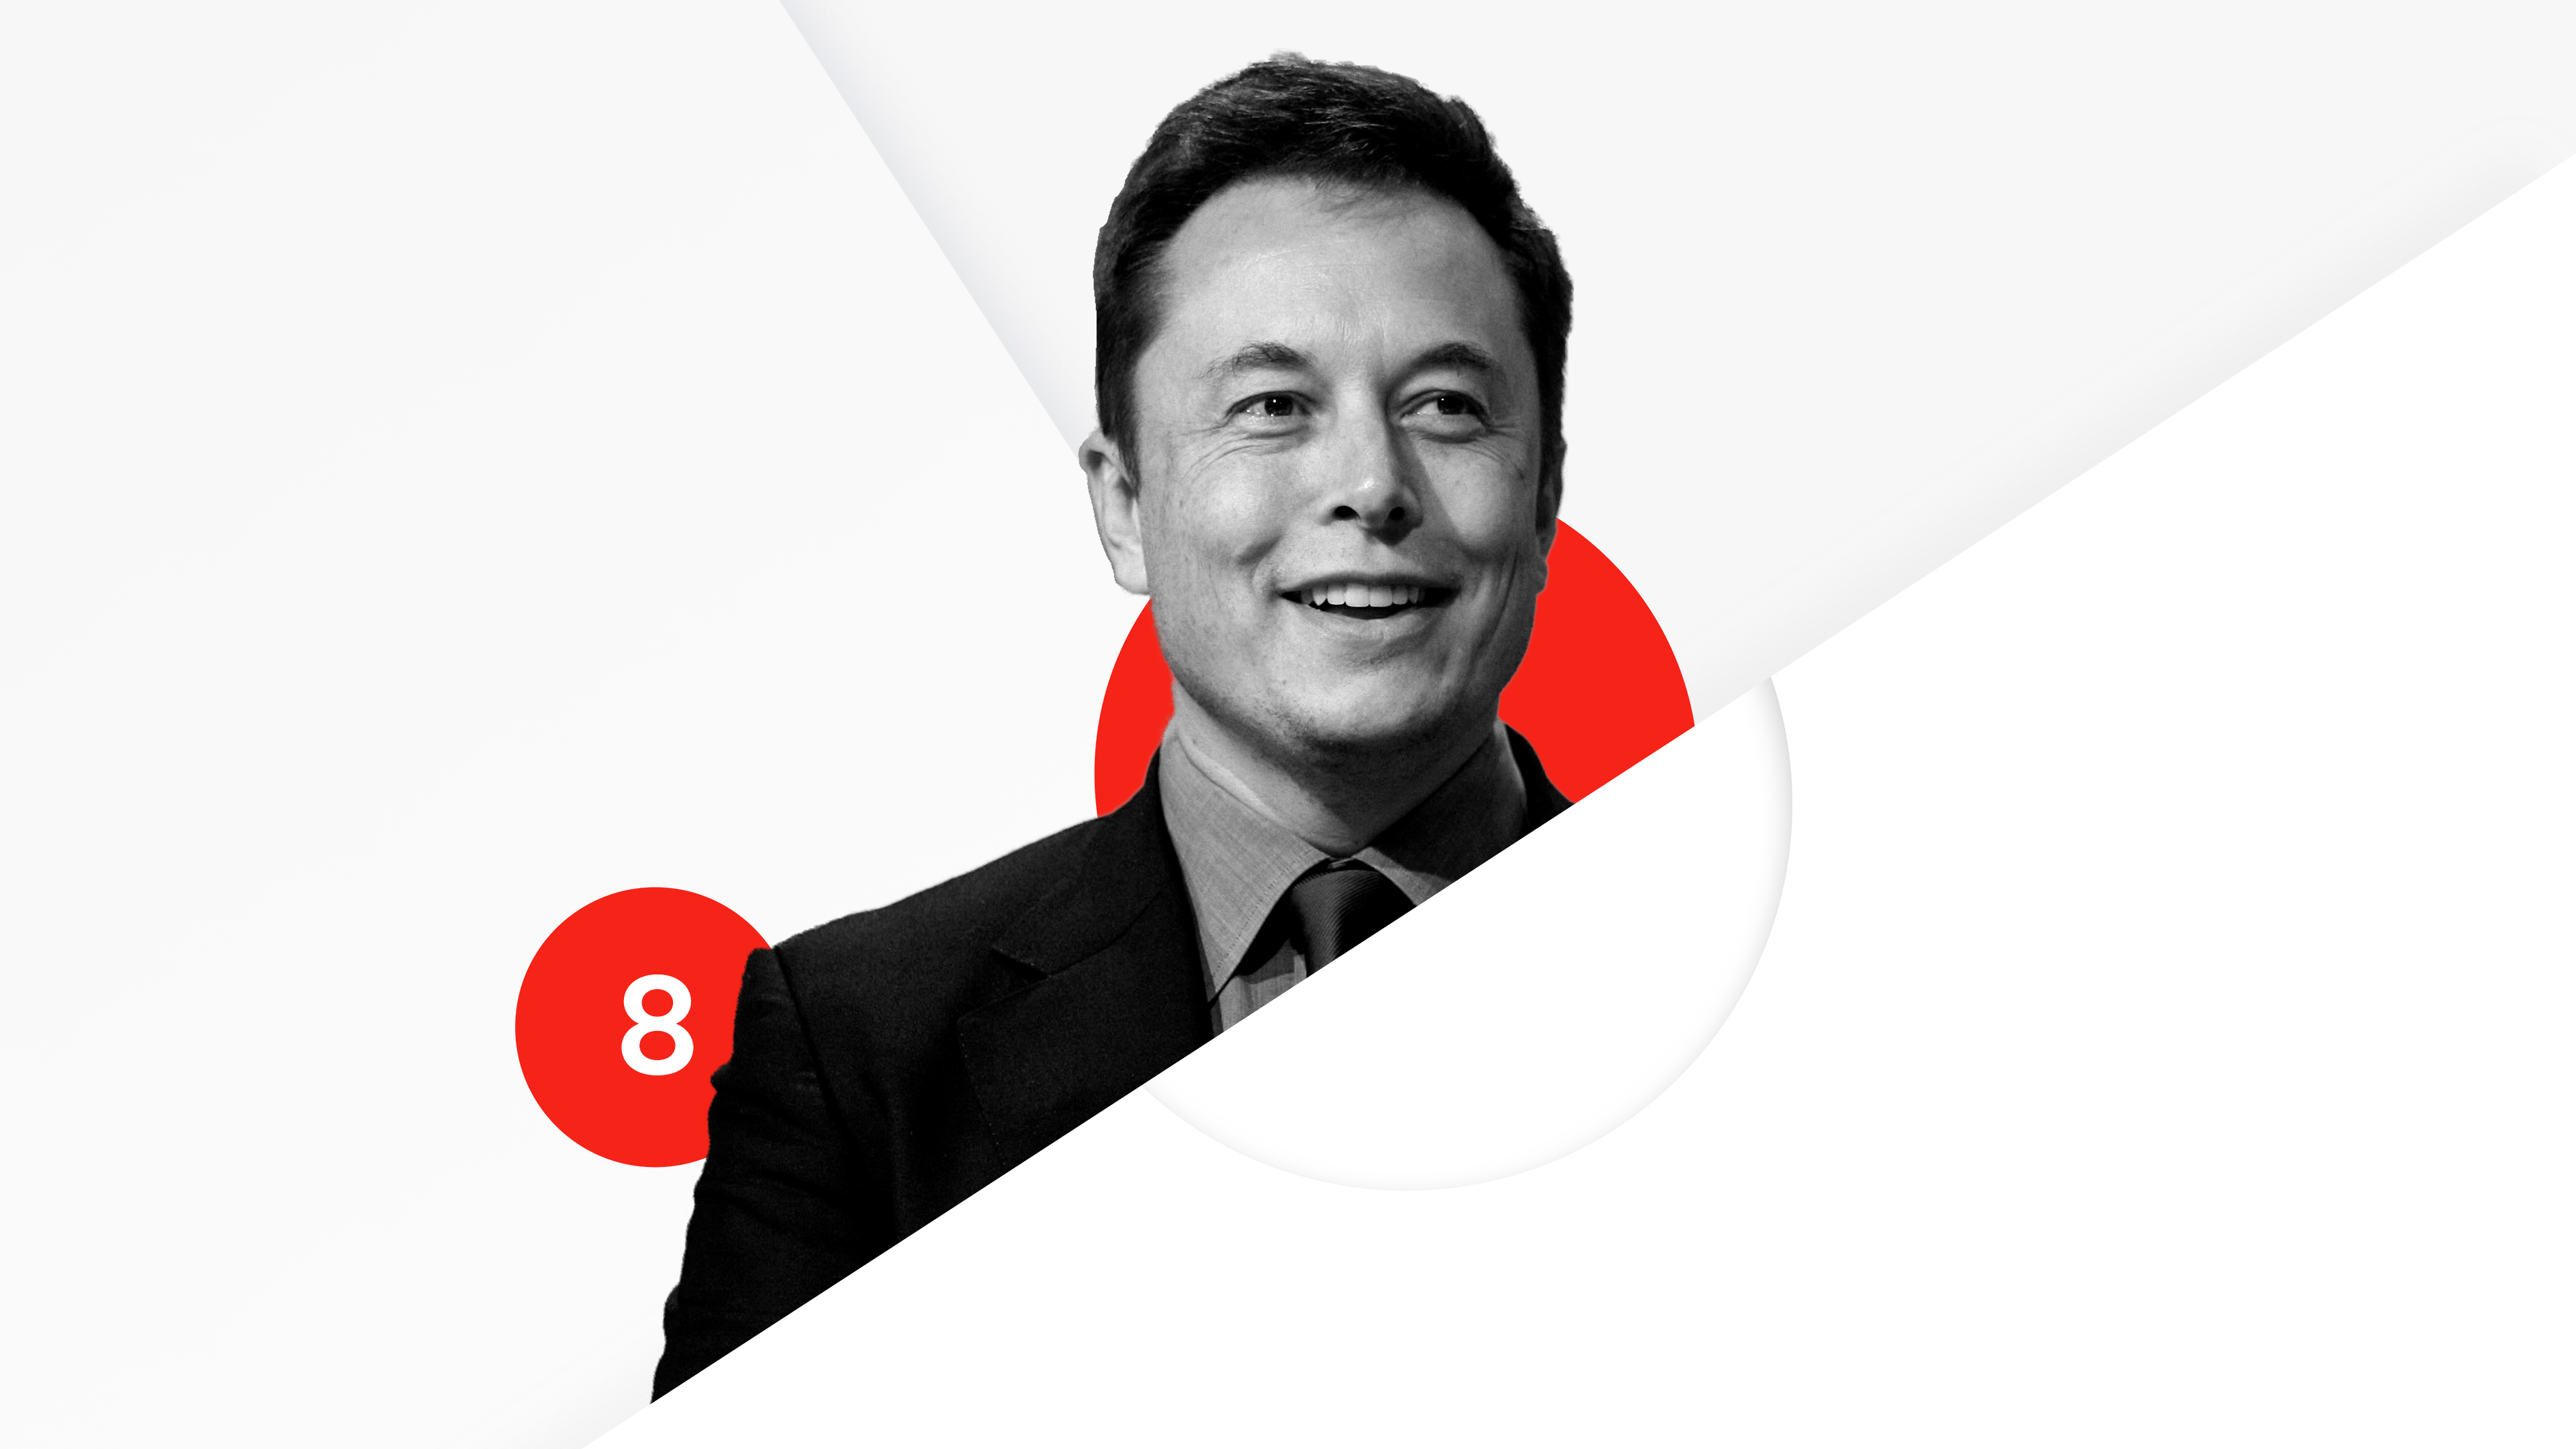 Tesla's Elon Musk is No. 8 on the Recode 100.